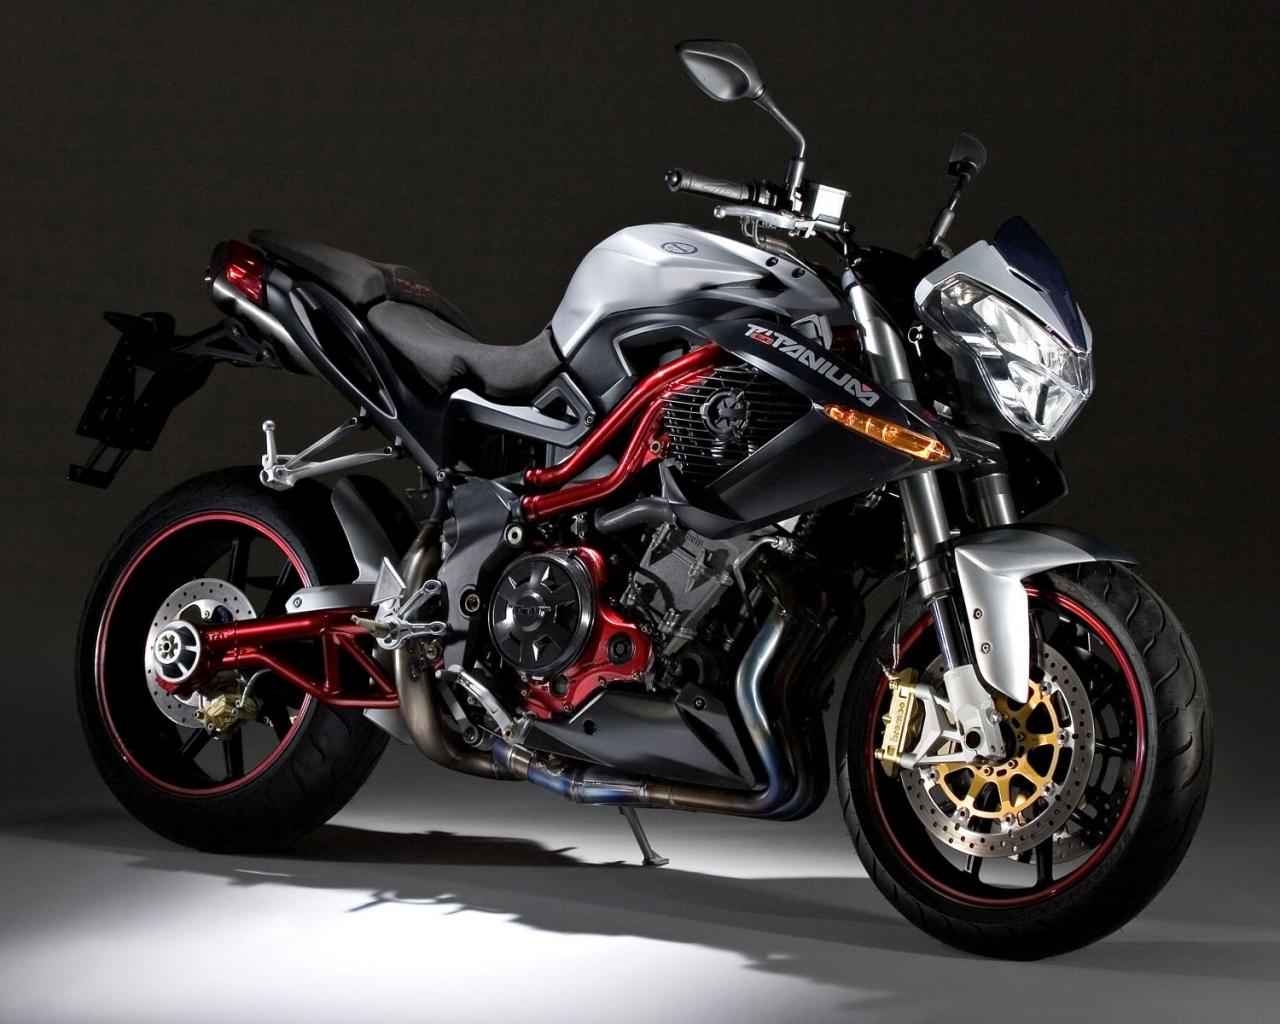 Moto Benelli - 1280x1024